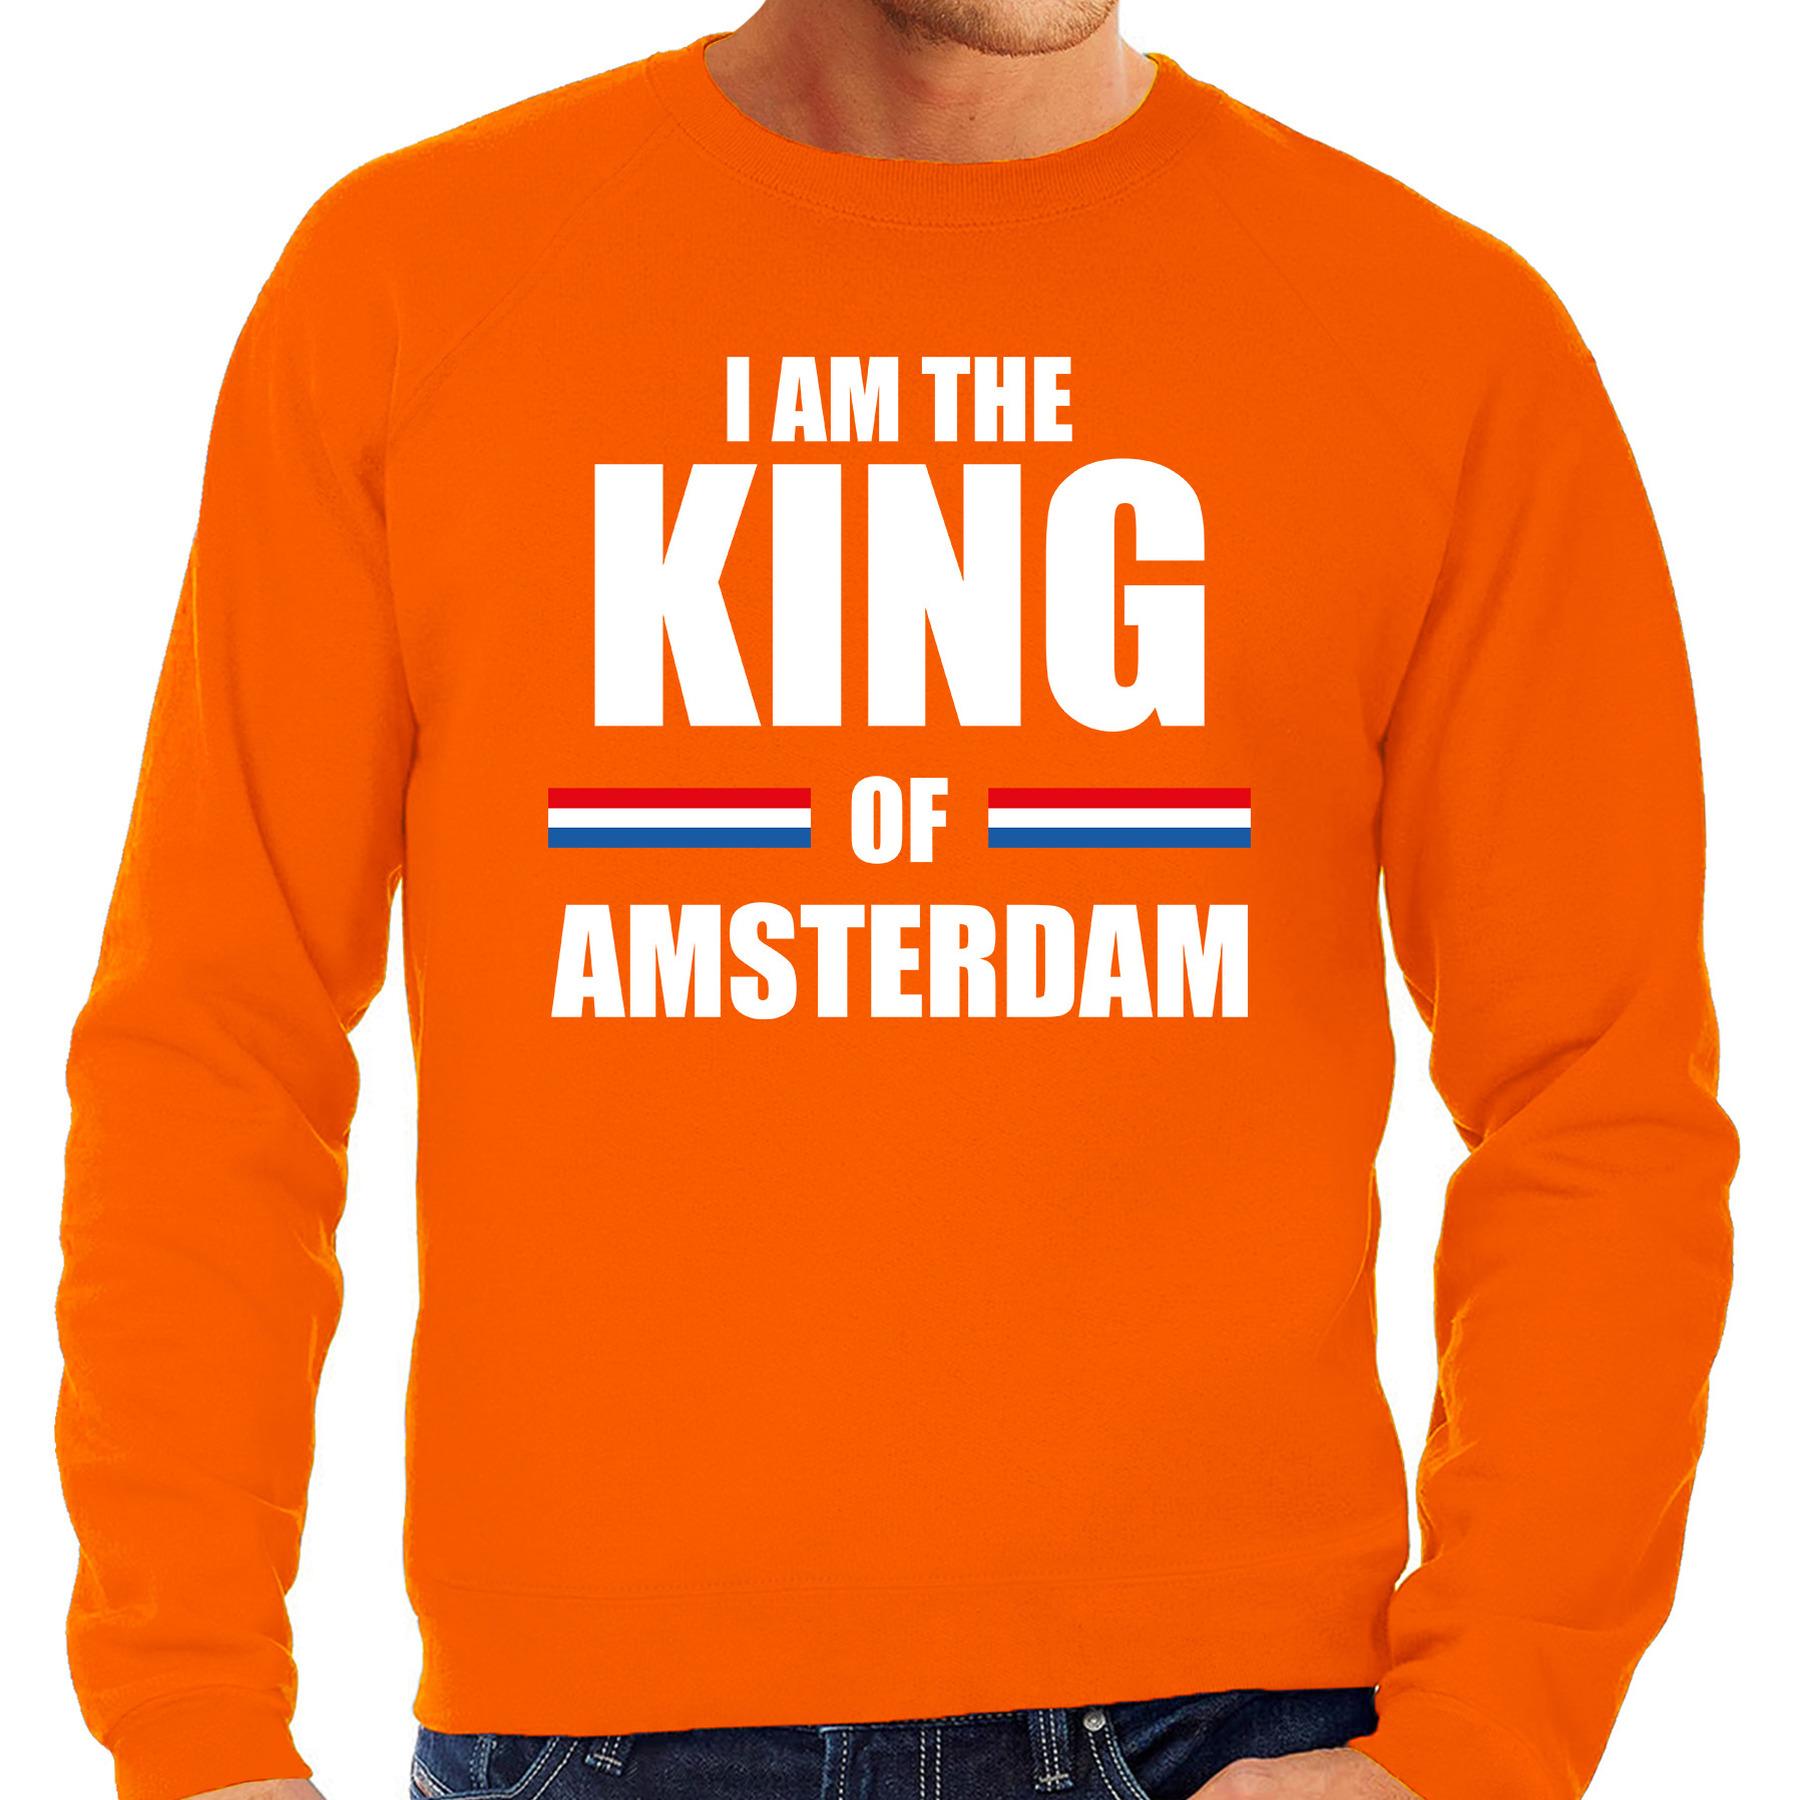 Oranje i am the king of amsterdam sweater koningsdag truien voor heren